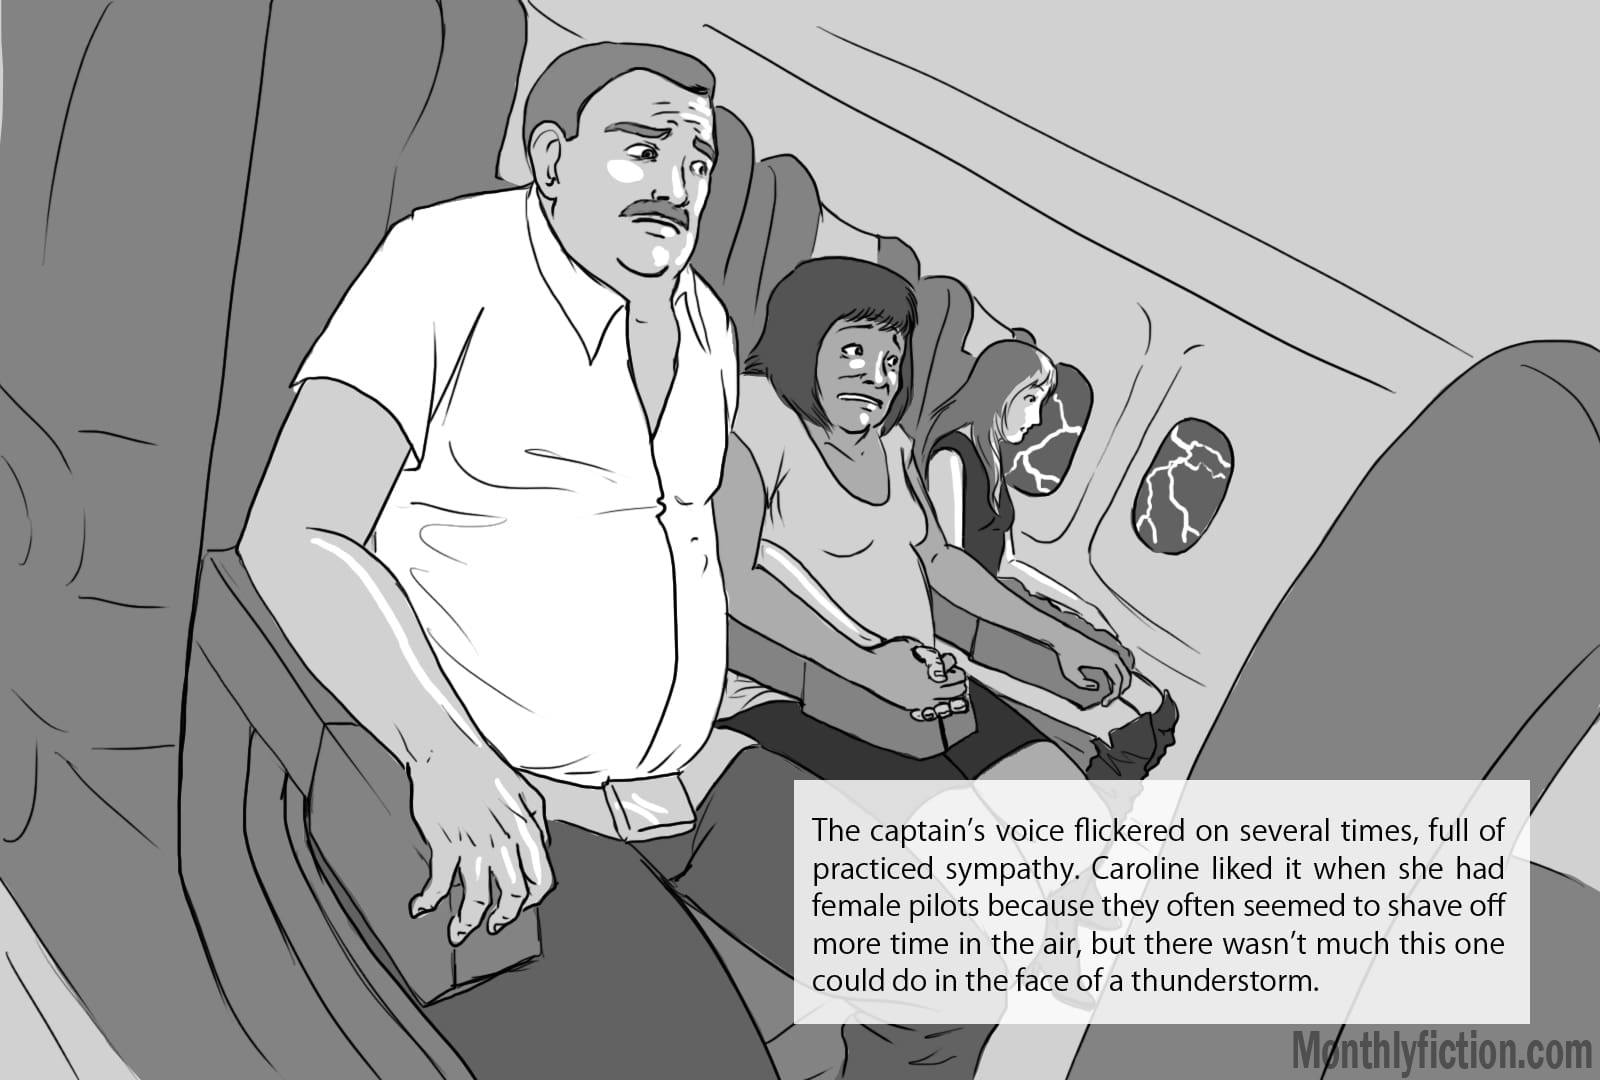 Monthly Fiction Takeoffs and landings illustration illustraded story deborah burke camilo sandoval page 20